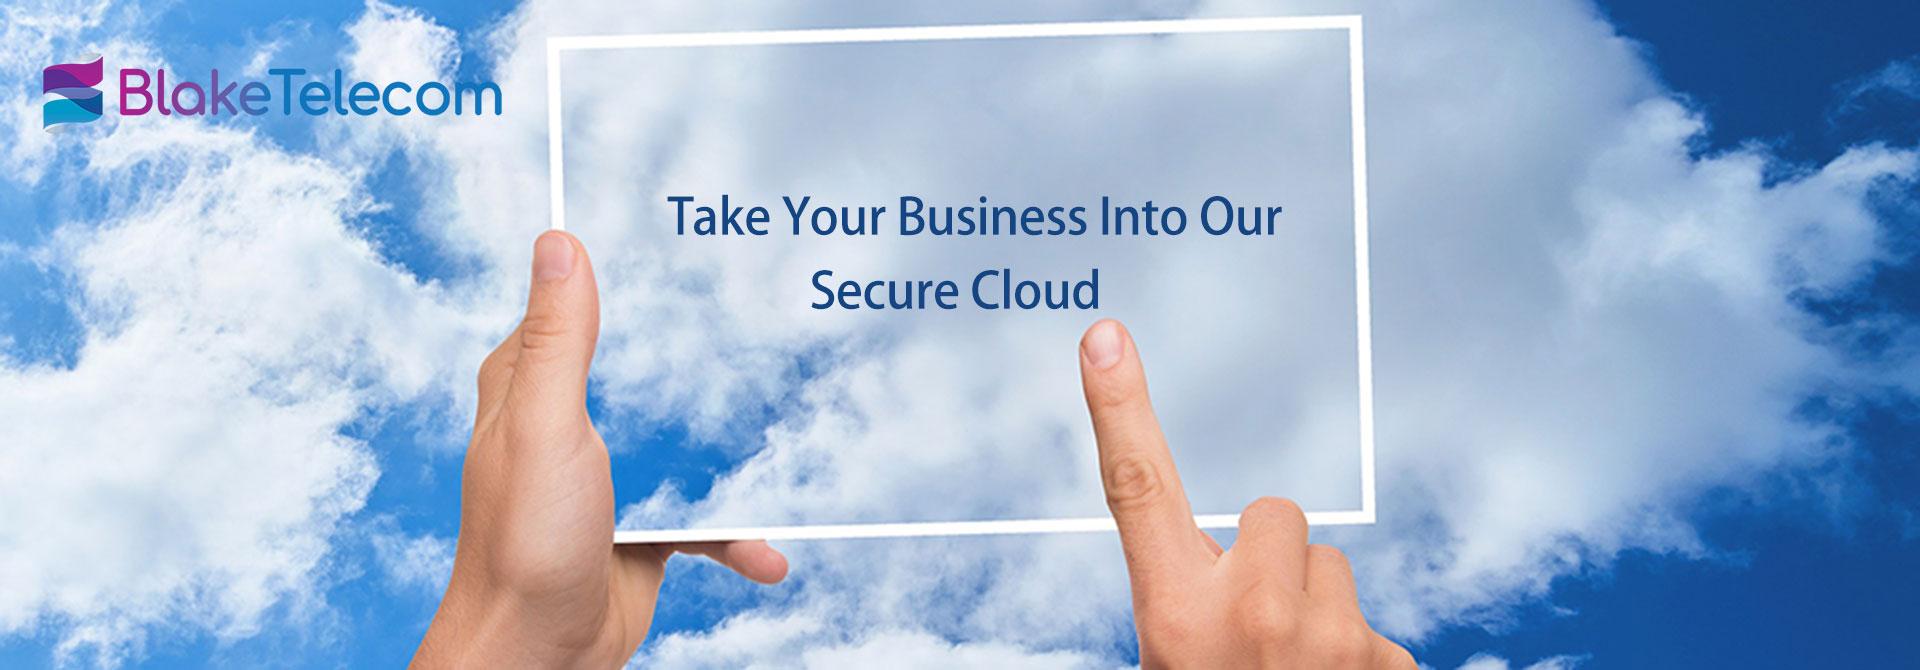 cloud technology by Blake Telecom